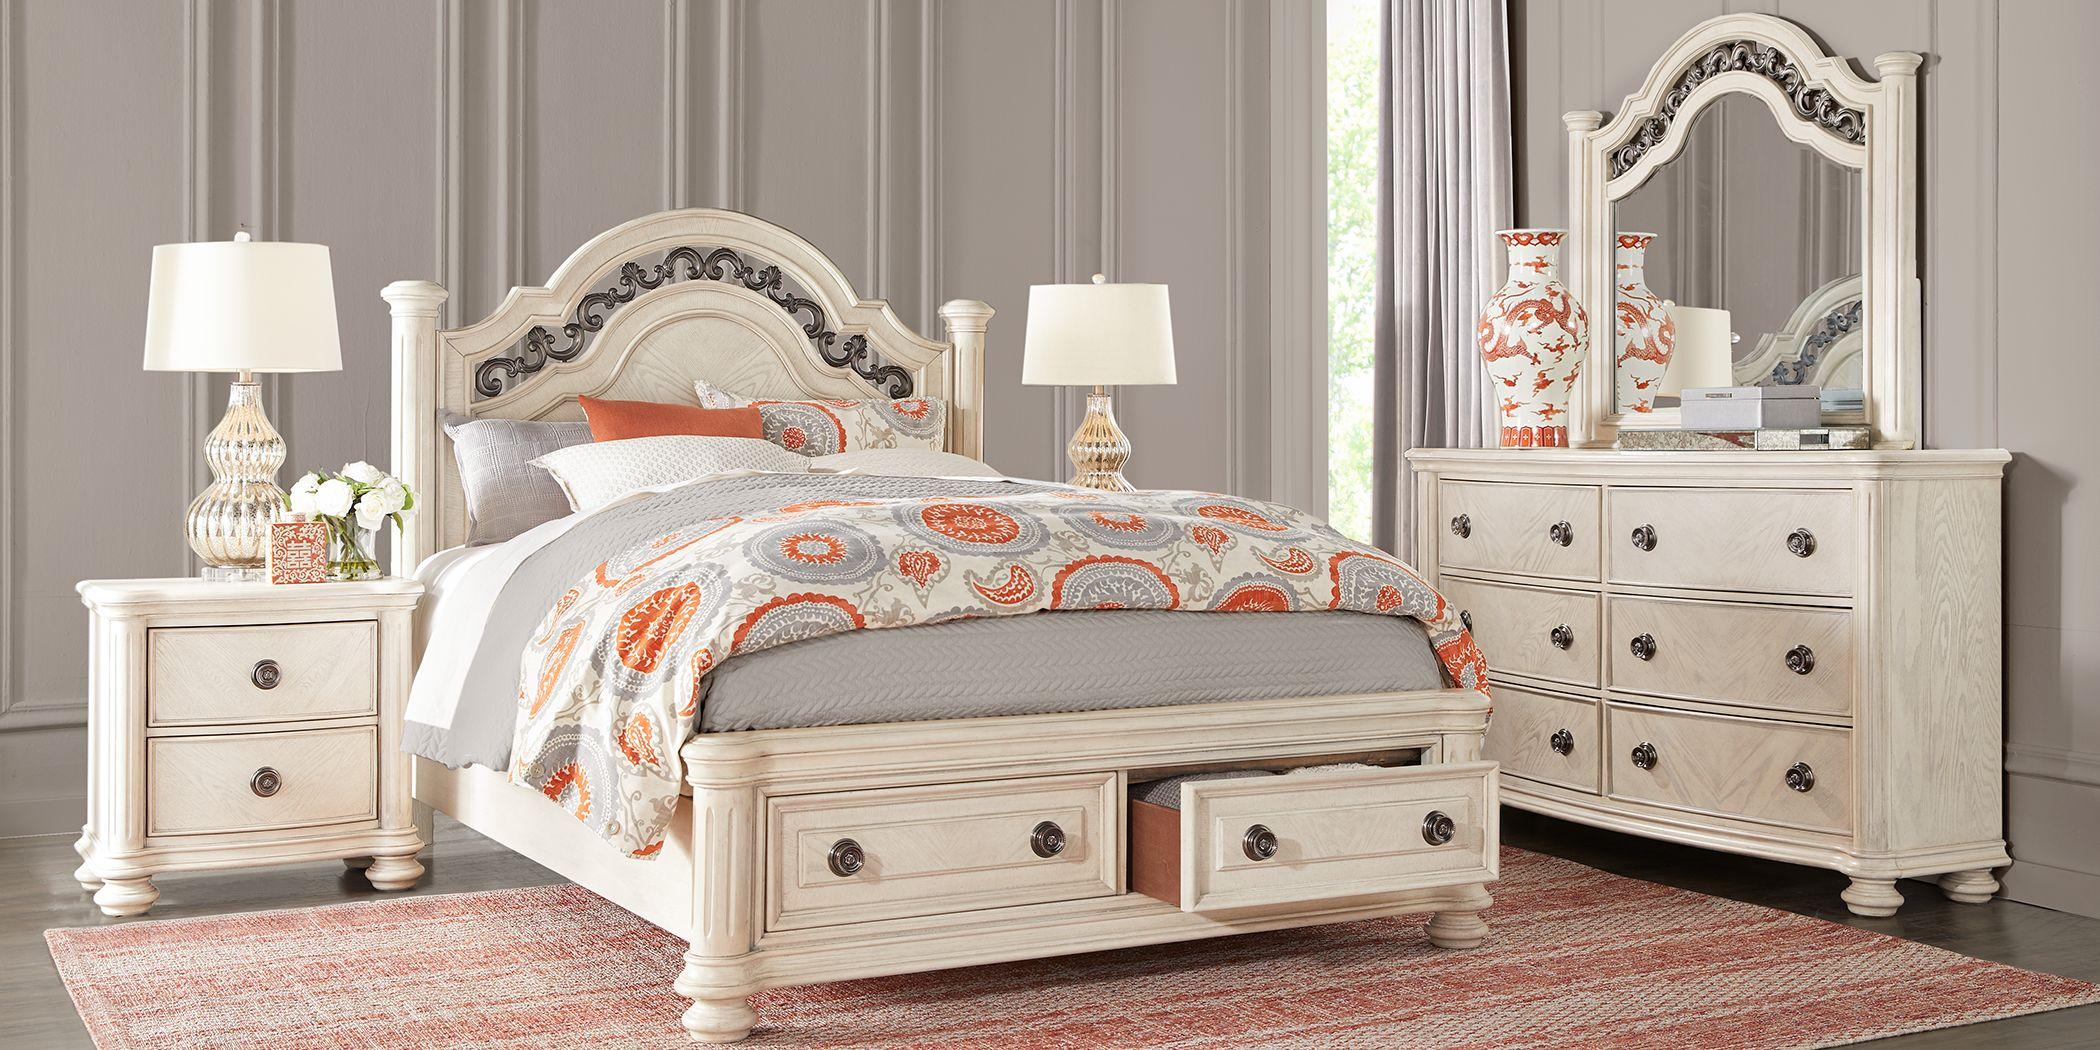 Anastasia White 5 Pc King Panel Bedroom with Storage